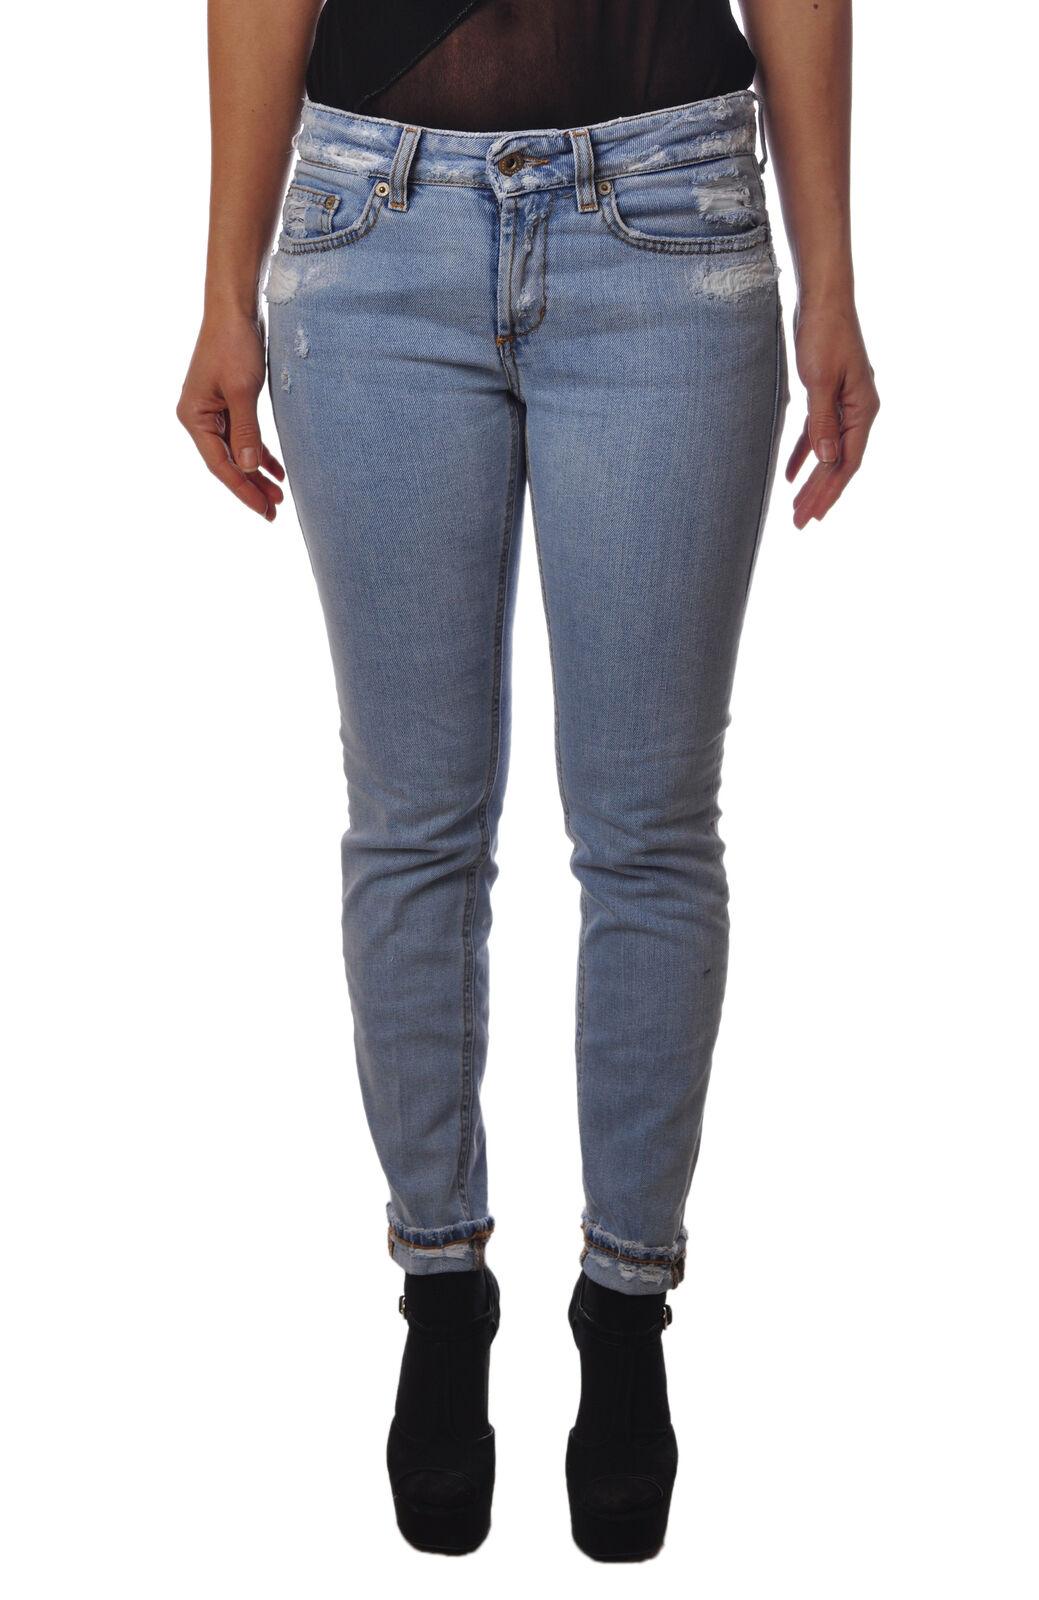 Dondup - Jeans-Pants - Woman - Denim -  4974125F191823  ventas directas de fábrica